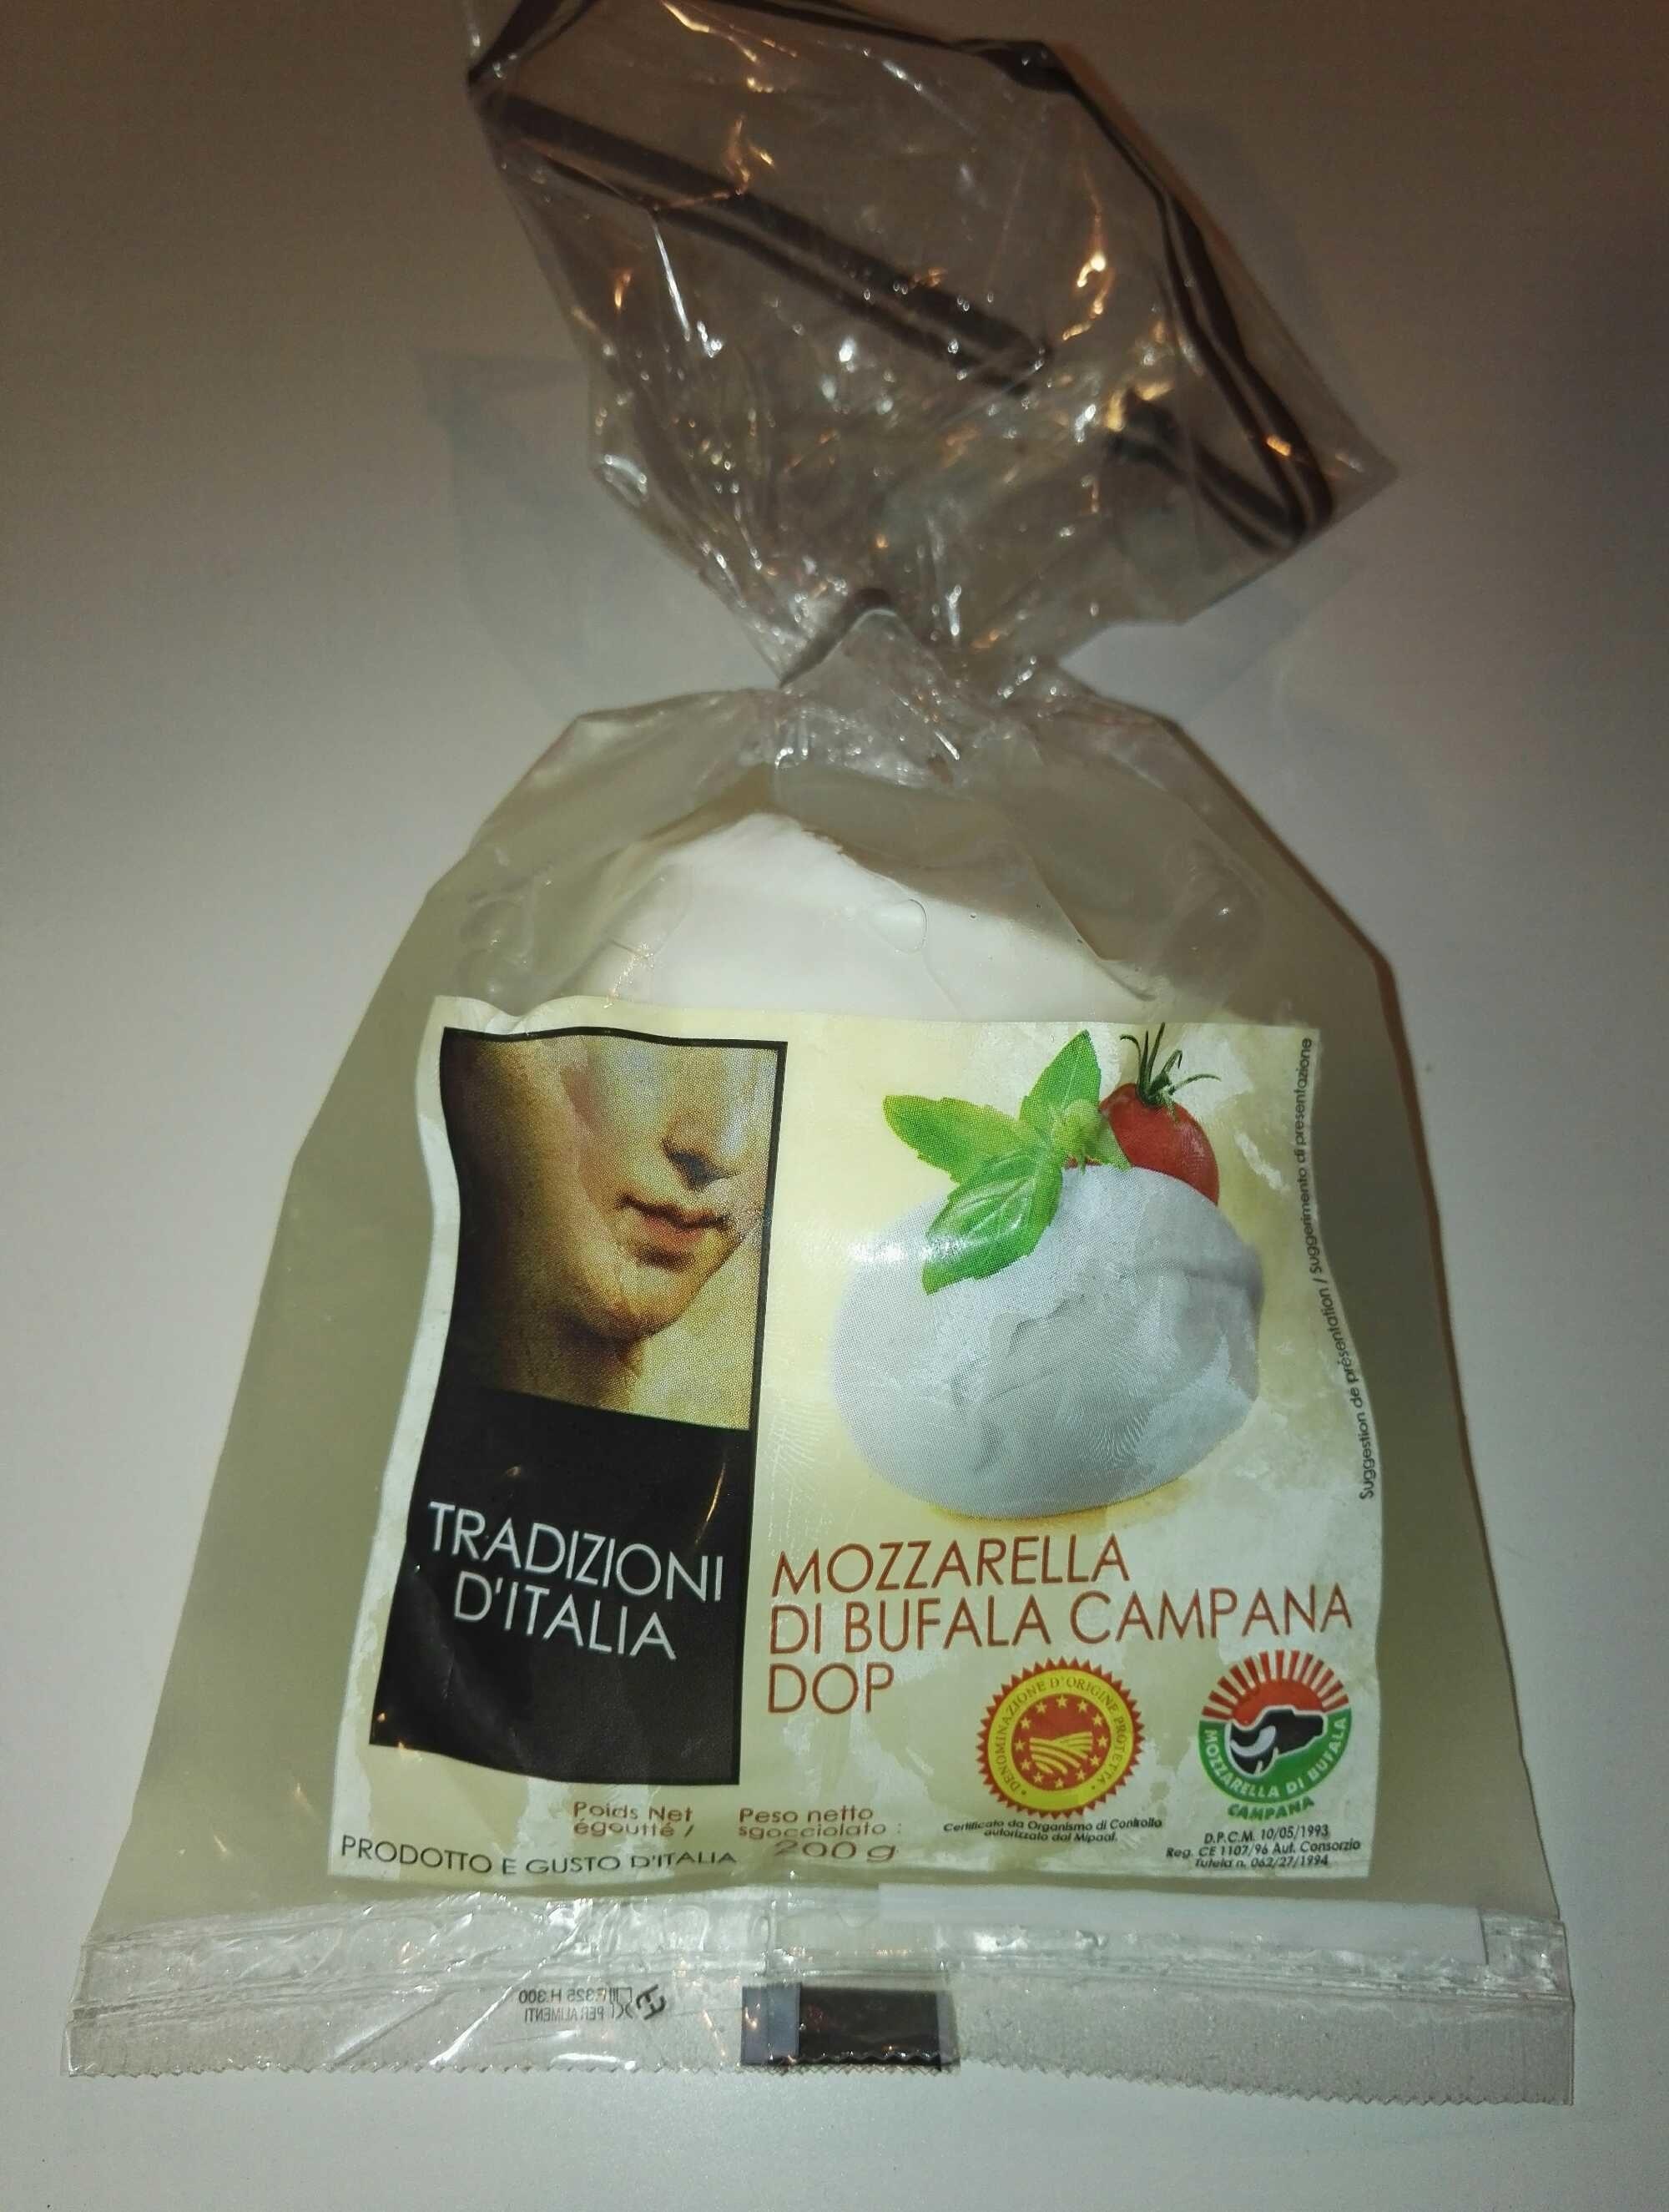 Mozzarella Di Bufala Campana DOP - Product